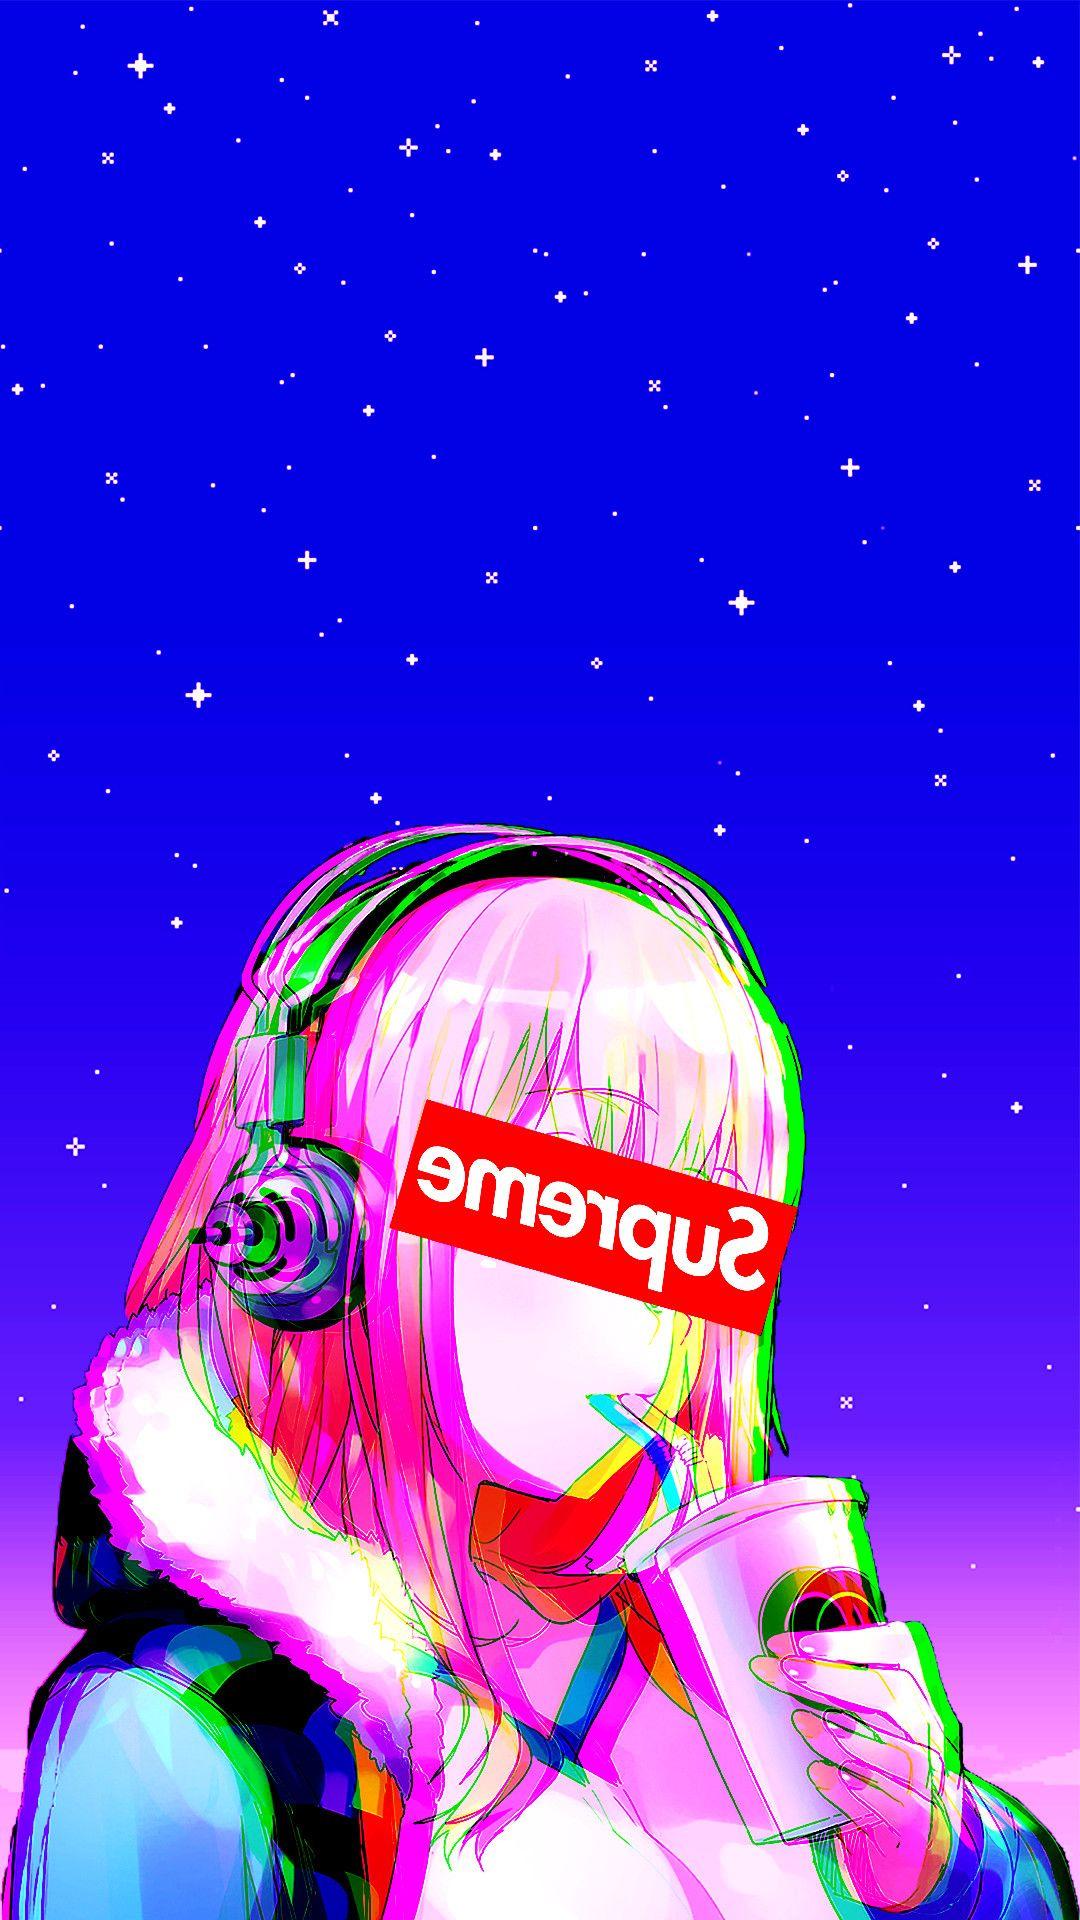 Super Sonico Supreme Anime Girls Headphones 1080x1920 Wallpaper Wallhaven Cc